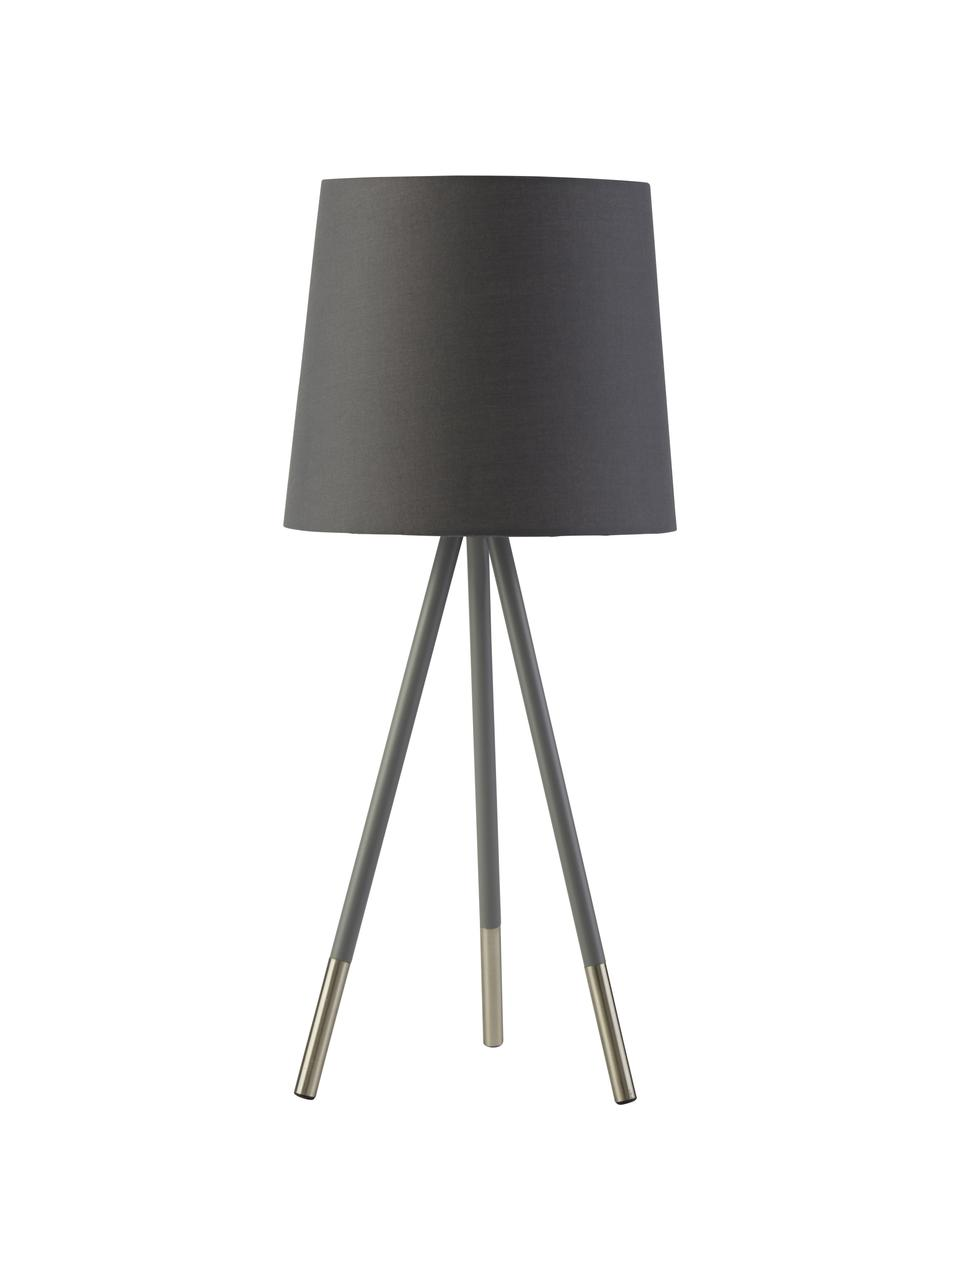 Grosse Tripod Tischlampe Ripo, Lampenschirm: Stoff, Dunkelgrau, Silberfarben, Ø 23 x H 54 cm